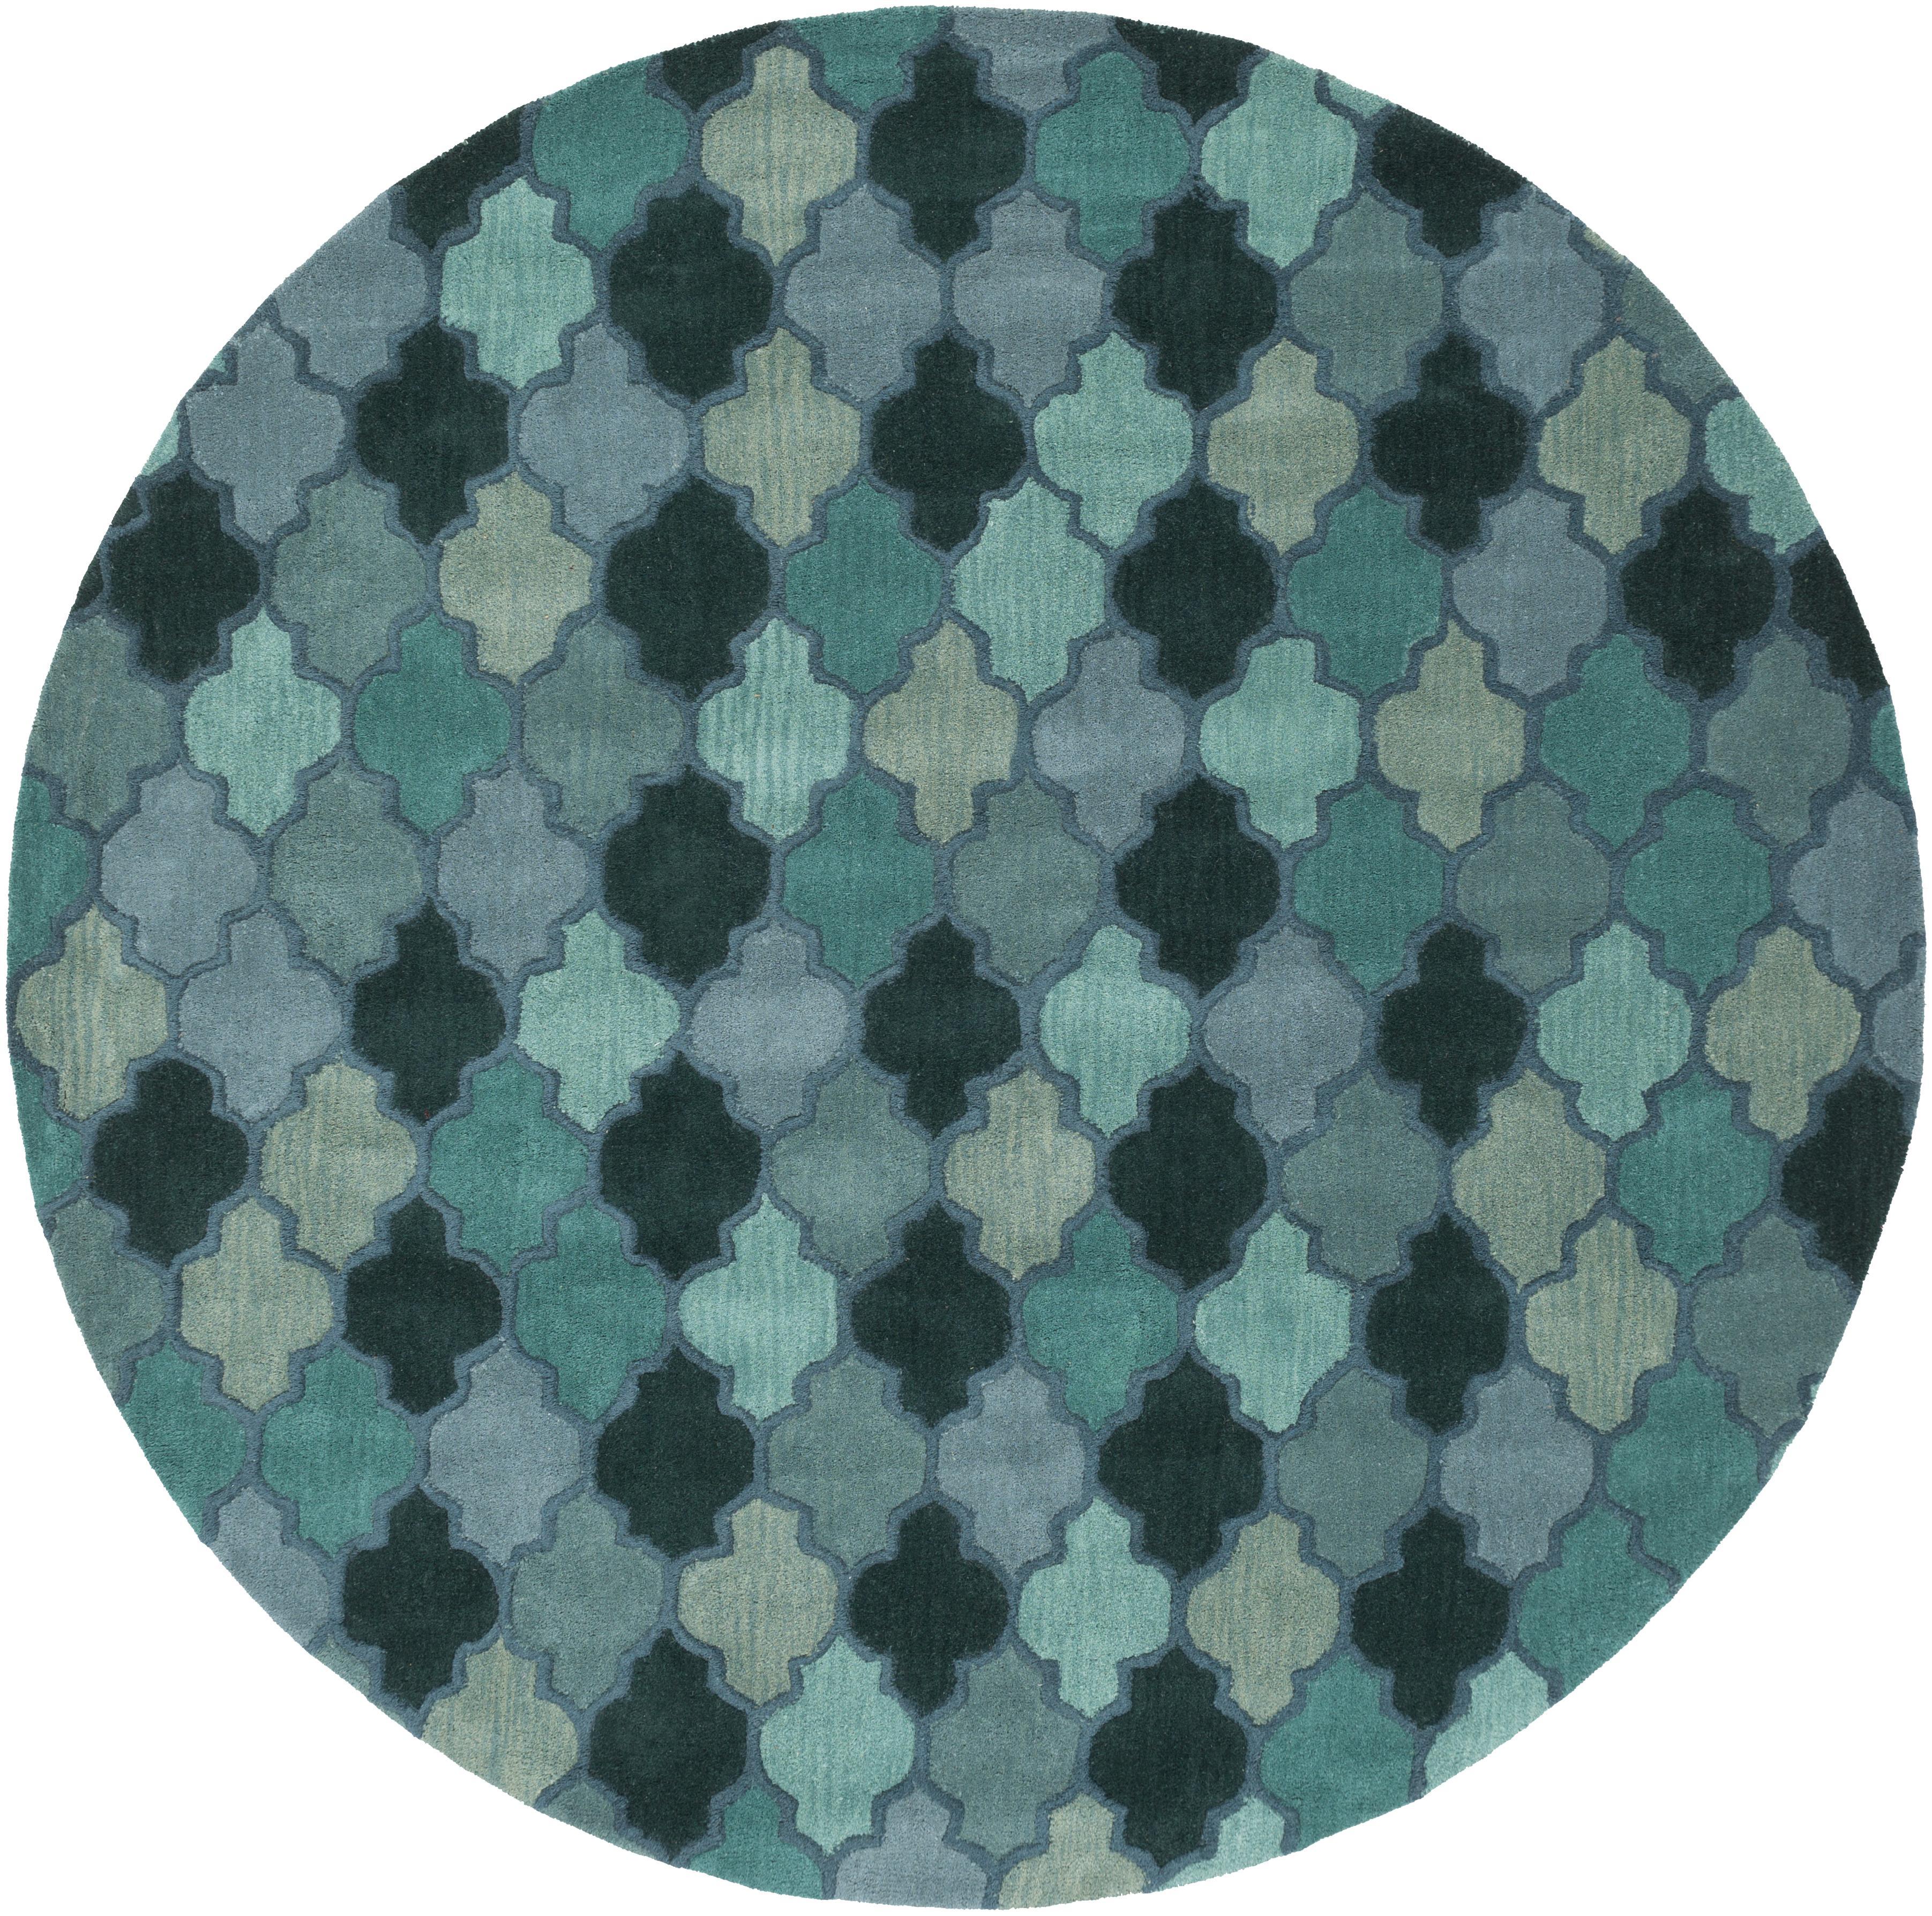 Surya Rugs Oasis 8' Round - Item Number: OAS1102-8RD